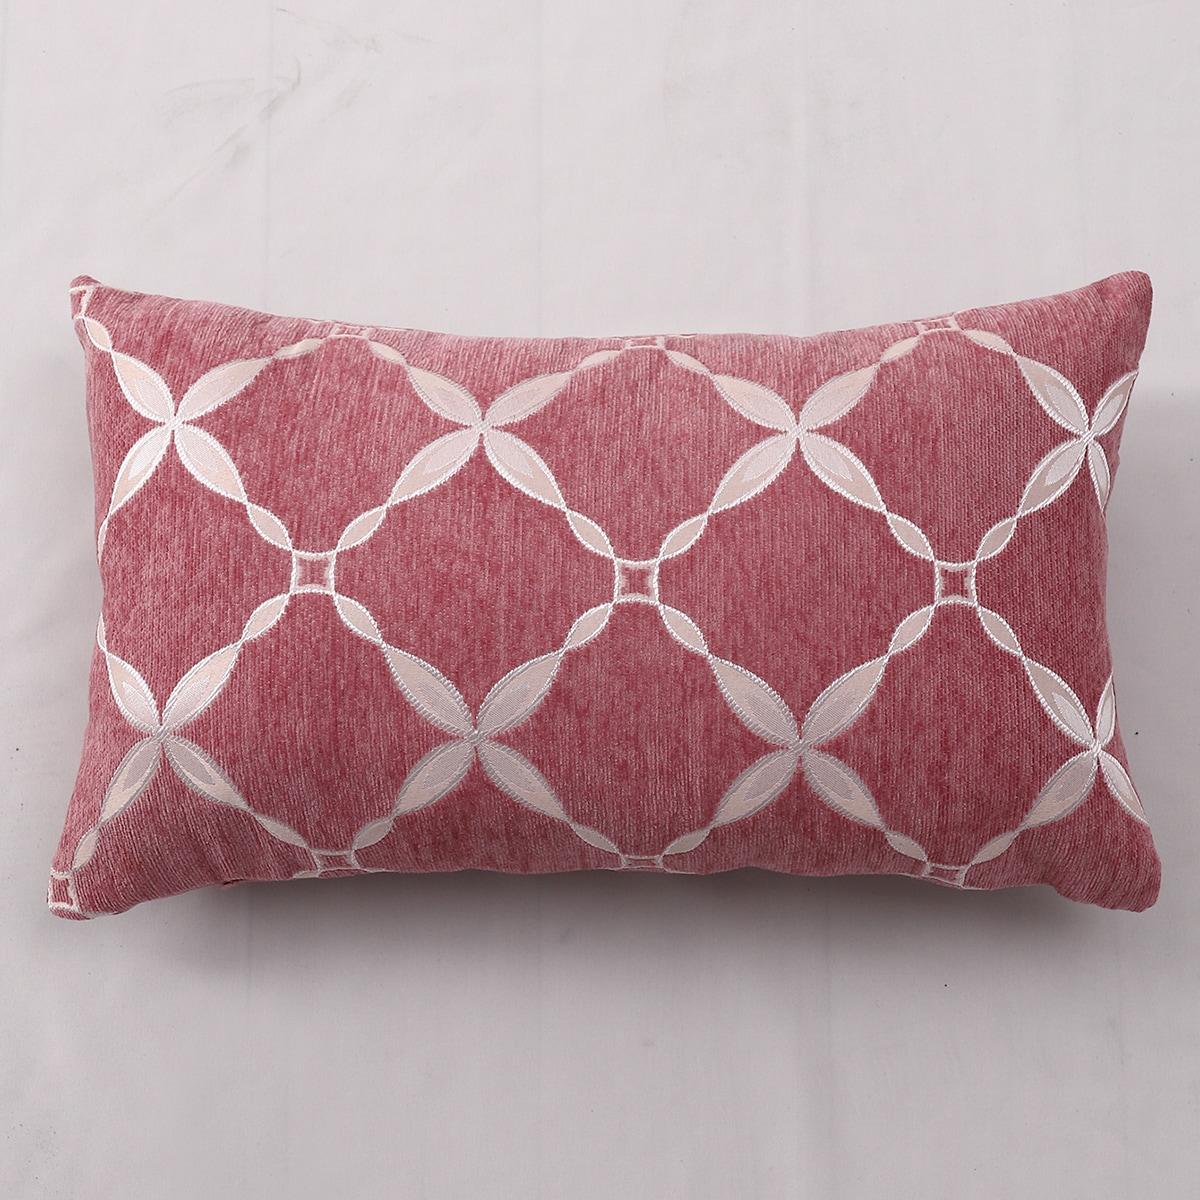 Plaid Pattern Lumbar Pillowcase Without Filler